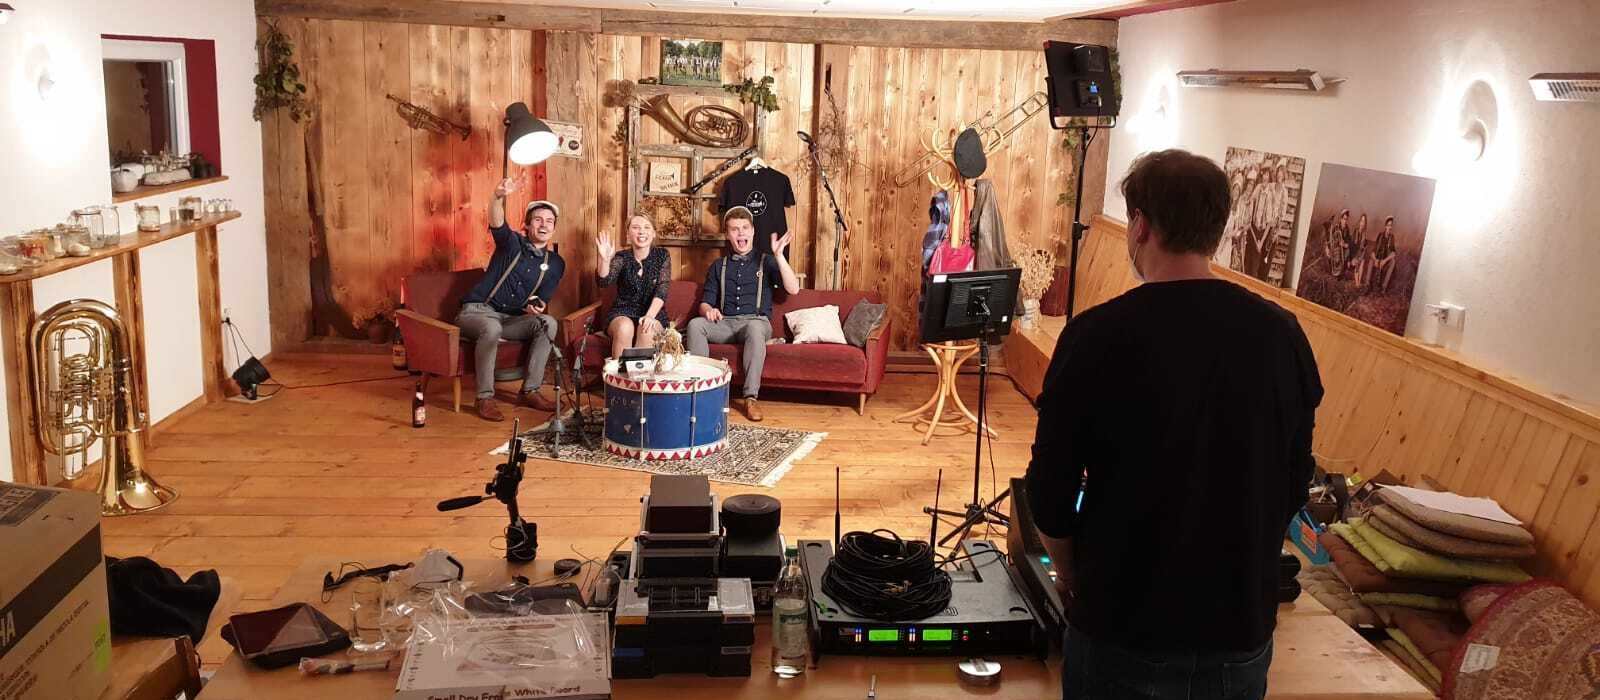 Virtuelle Event & Livestream Produktion